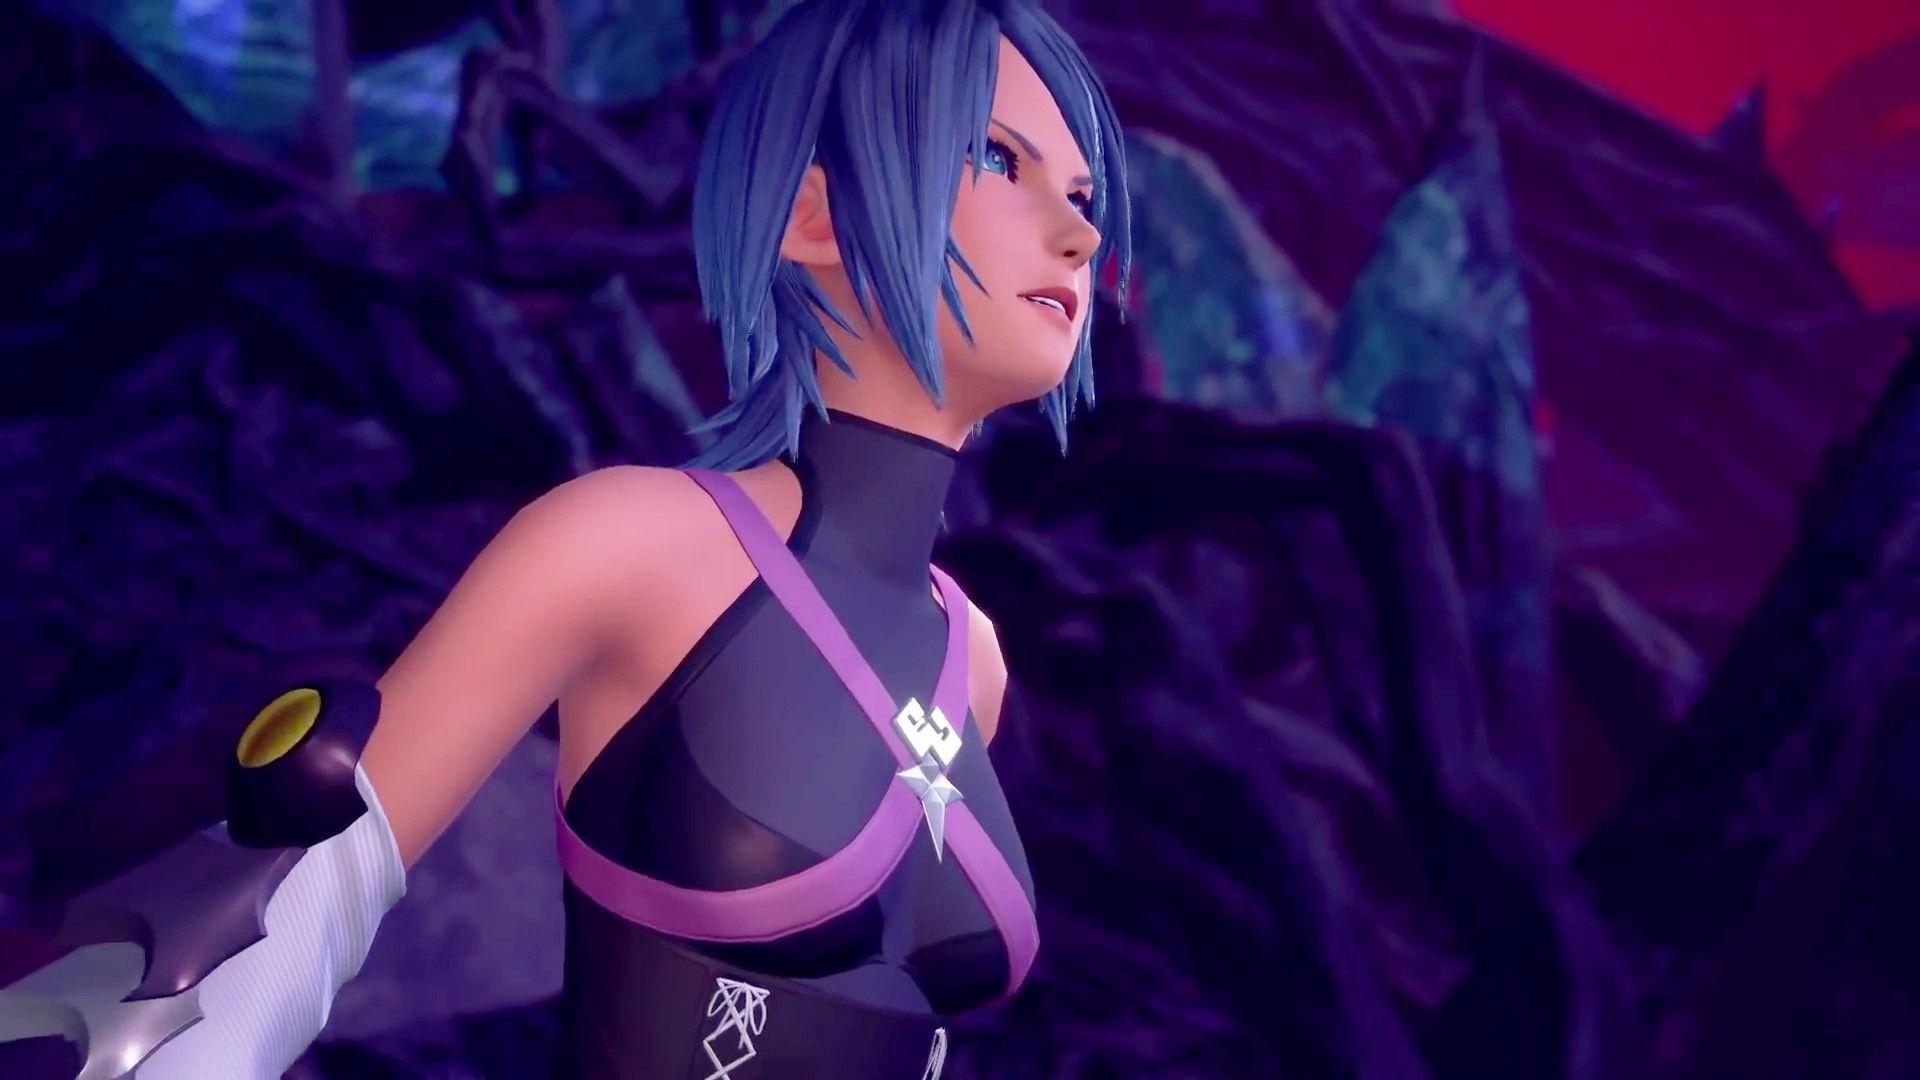 1920x1080 Kingdom Hearts 2 8 Aqua 1 By Vayne1510 Kingdom